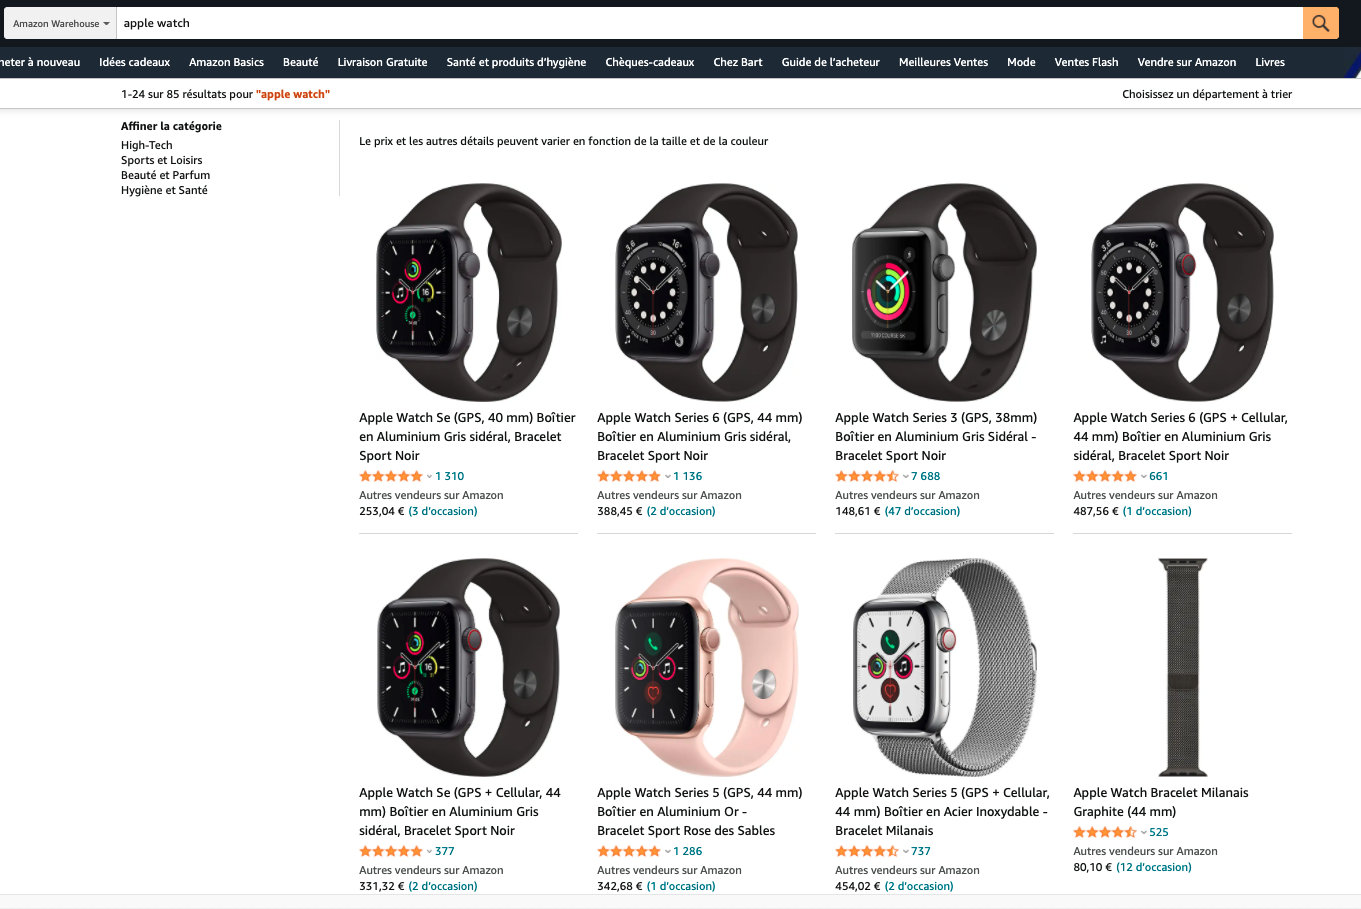 apple watch reconditionnée Amazon Warehouse